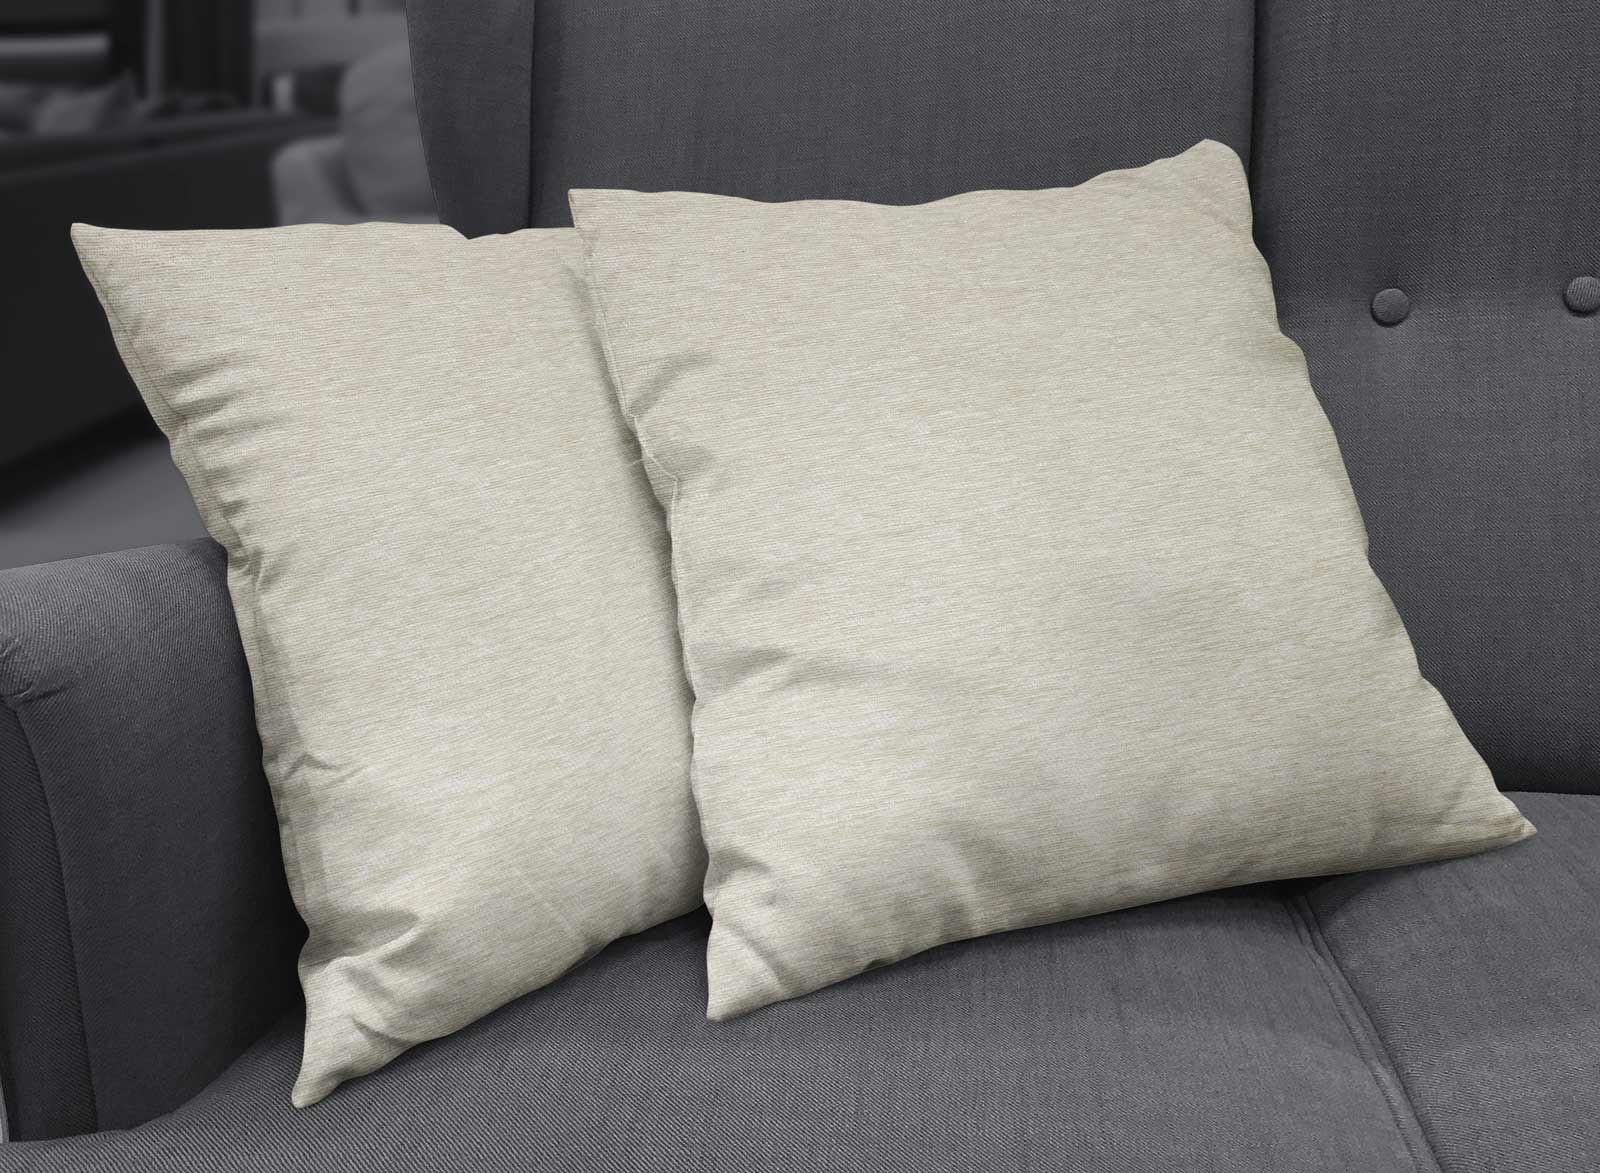 Set-of-2-Chenille-Cushion-Covers-Luxury-Plain-Cushions-Cover-Pairs-18-034-x-18-034 thumbnail 37